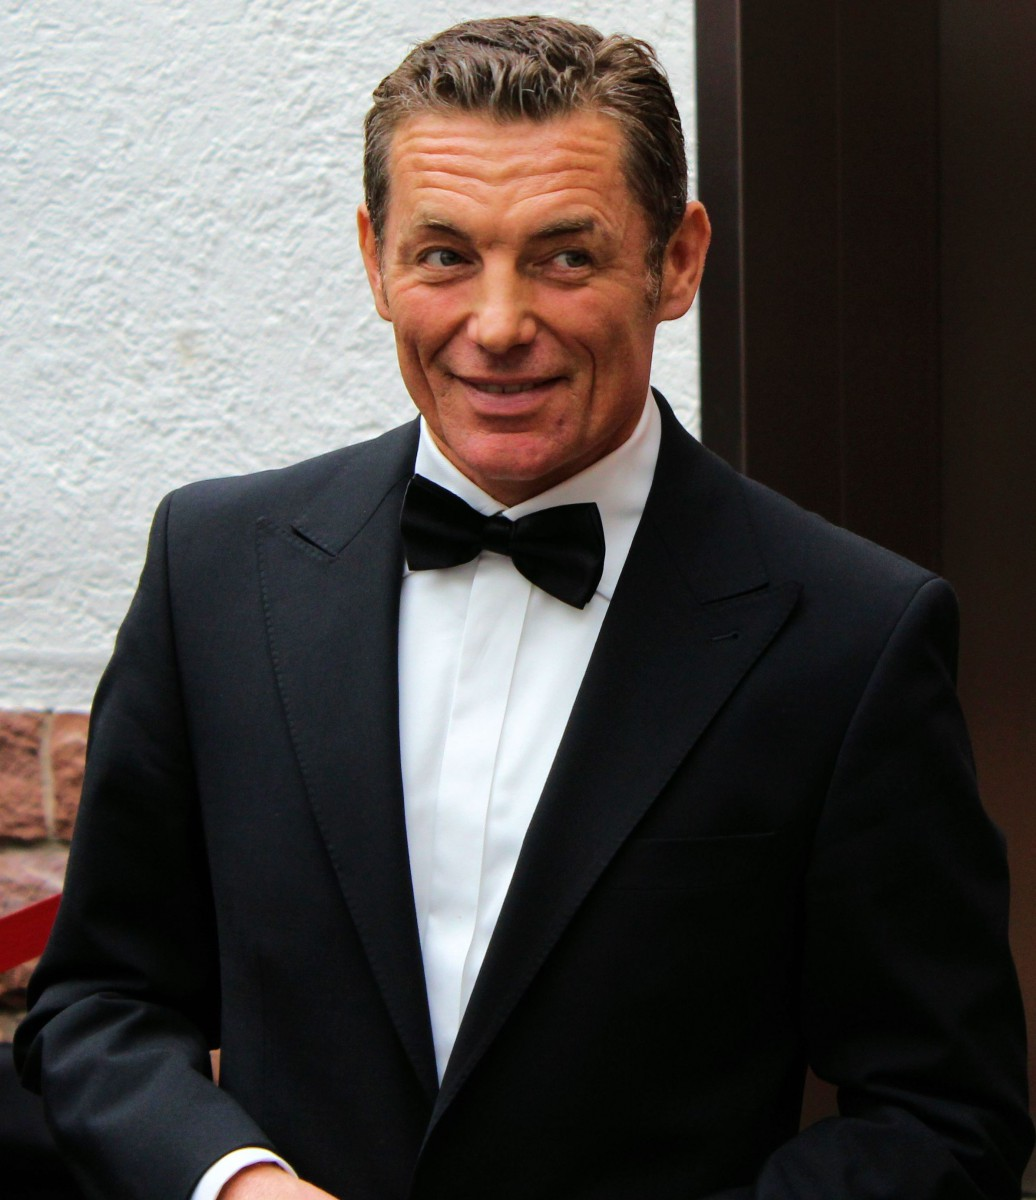 Dirk Pfister